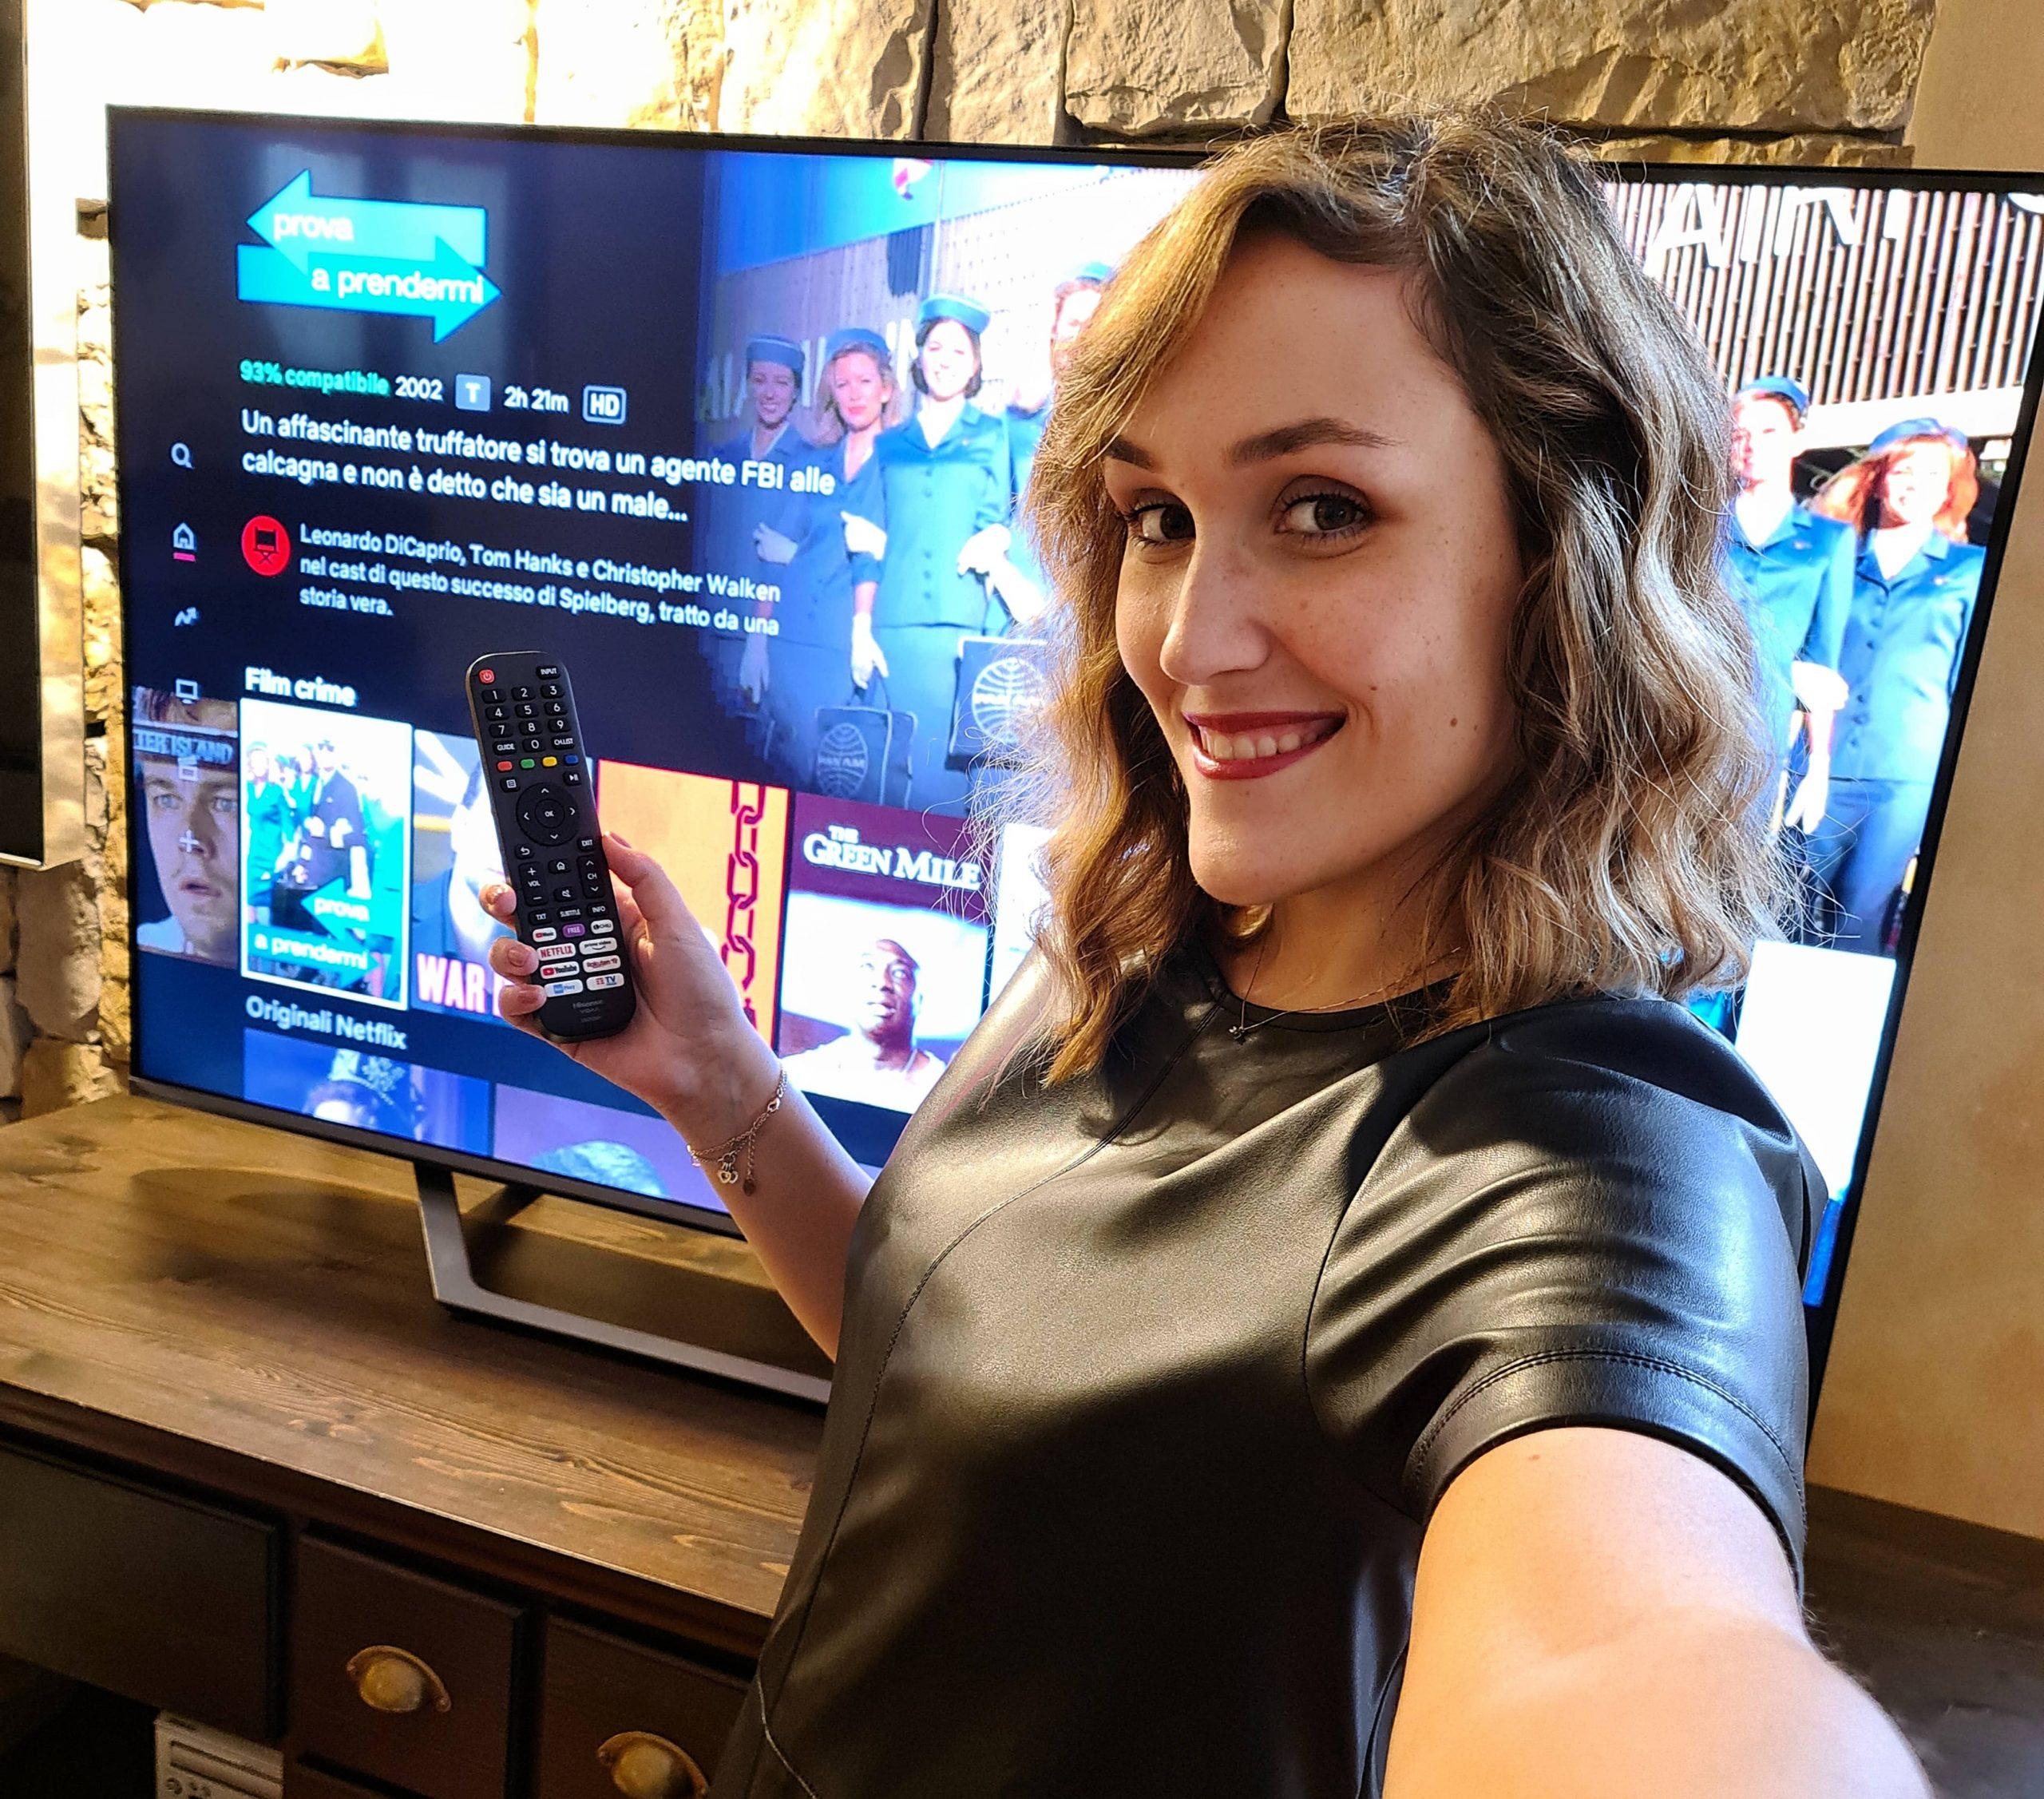 hisense smart tv tecnologia netflix amazon benessere tecnologico laura fasano tecnolaura